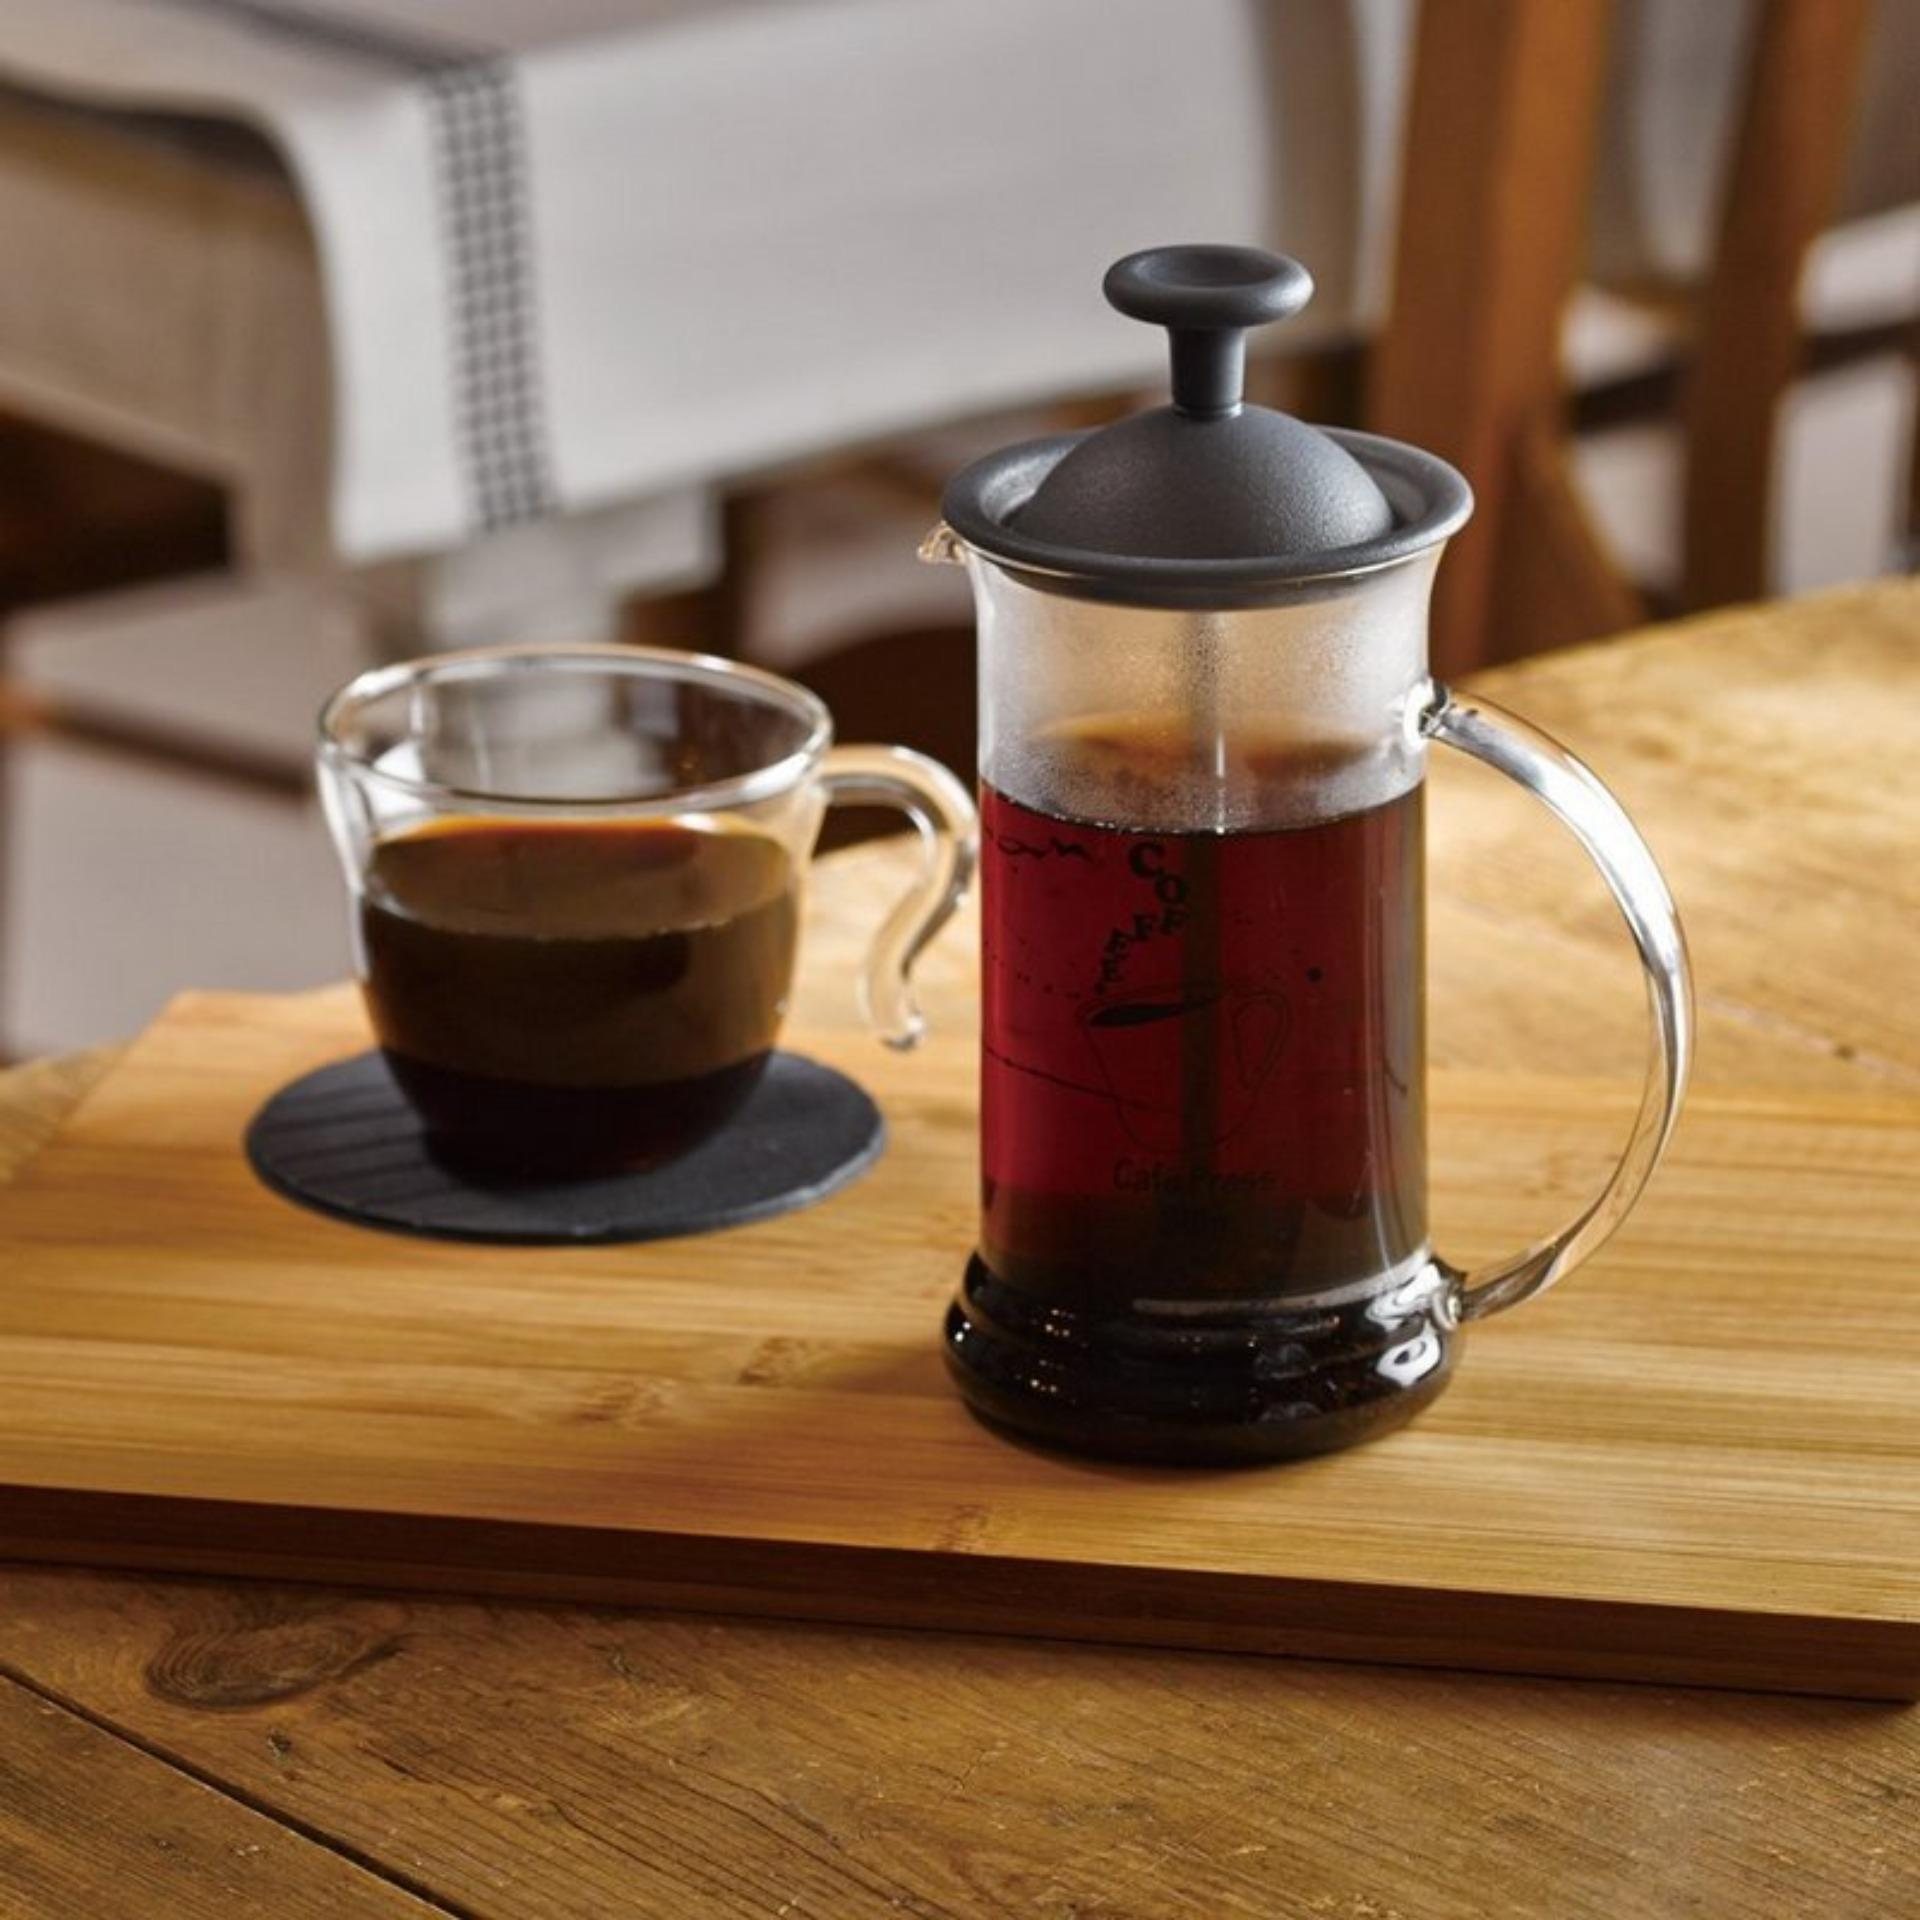 Hario Philippines Price List Coffee Syphon Tea Maker For Mizudashi Cold Brew Pot Red Mcpn 14r Press Slim